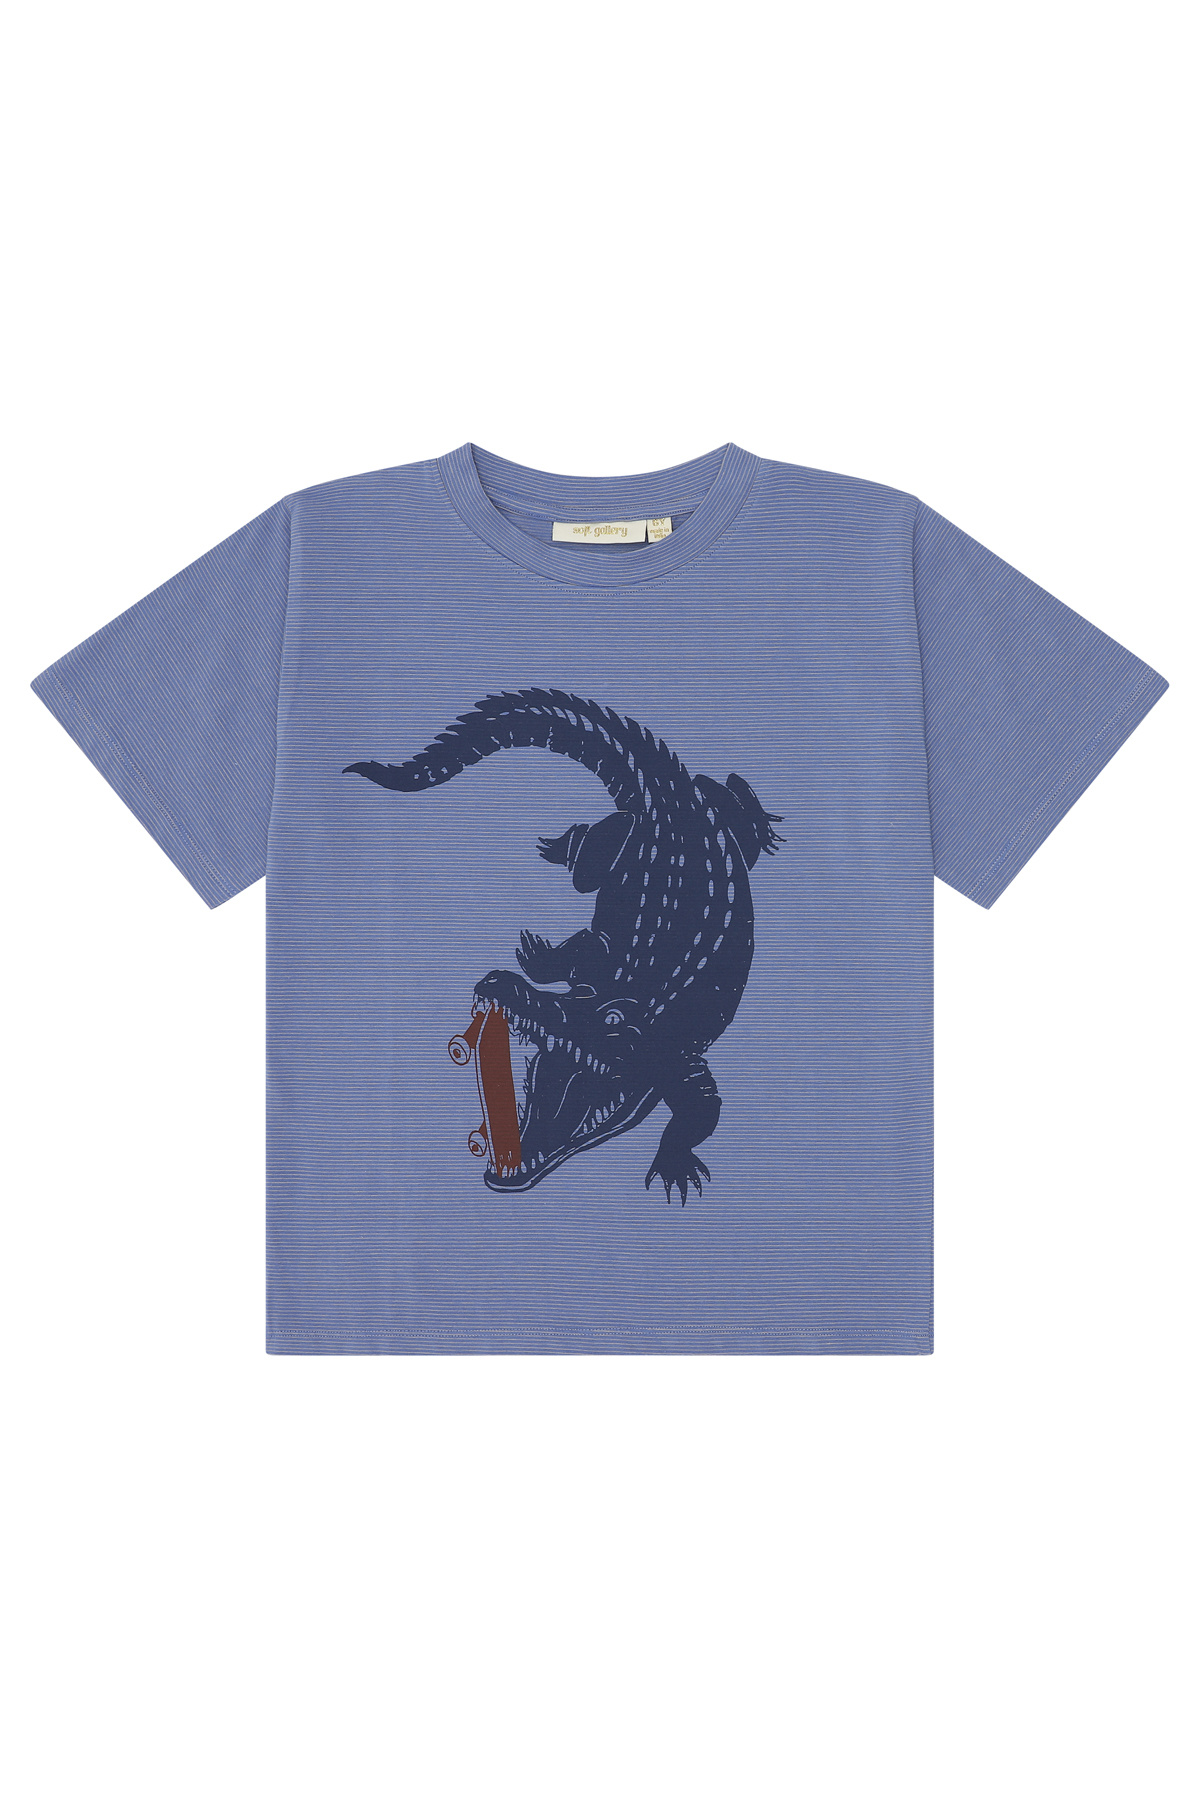 Dain t-shirt - Croissant-1